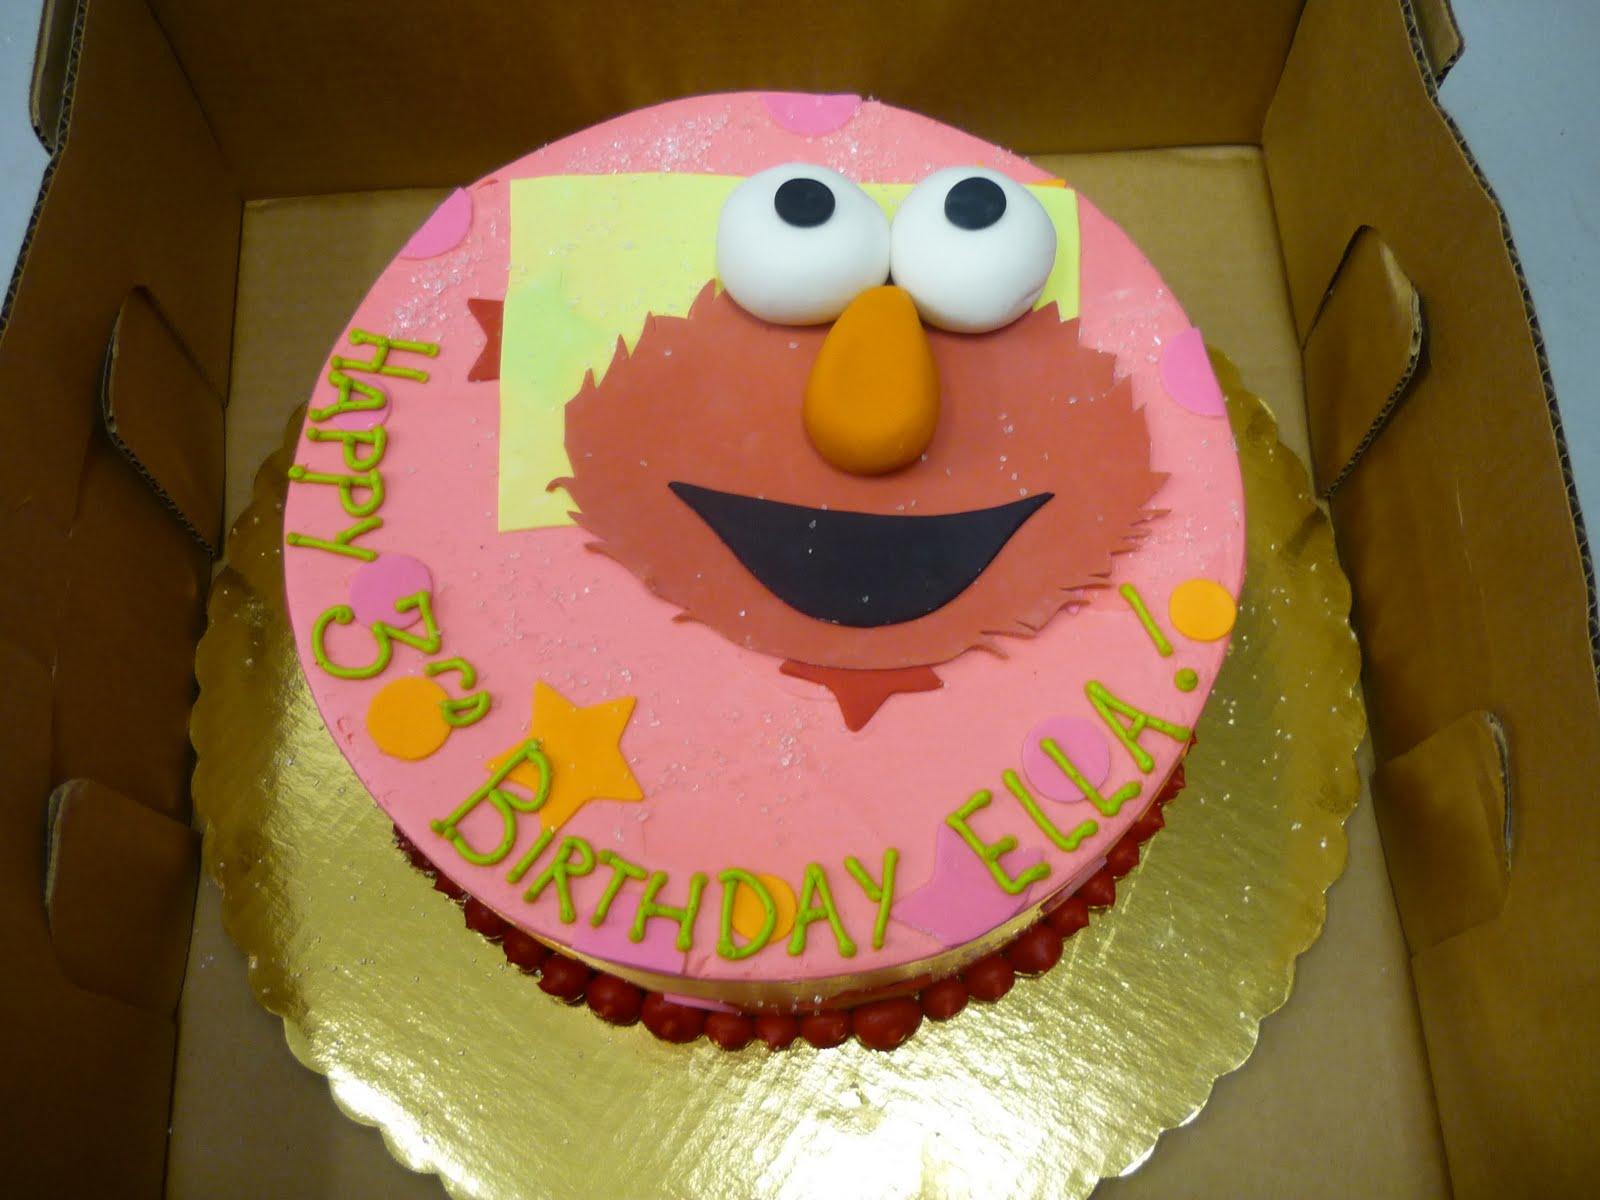 Artisan Bake Shop Round Buttercream Birthday Cake Elmo on Pink